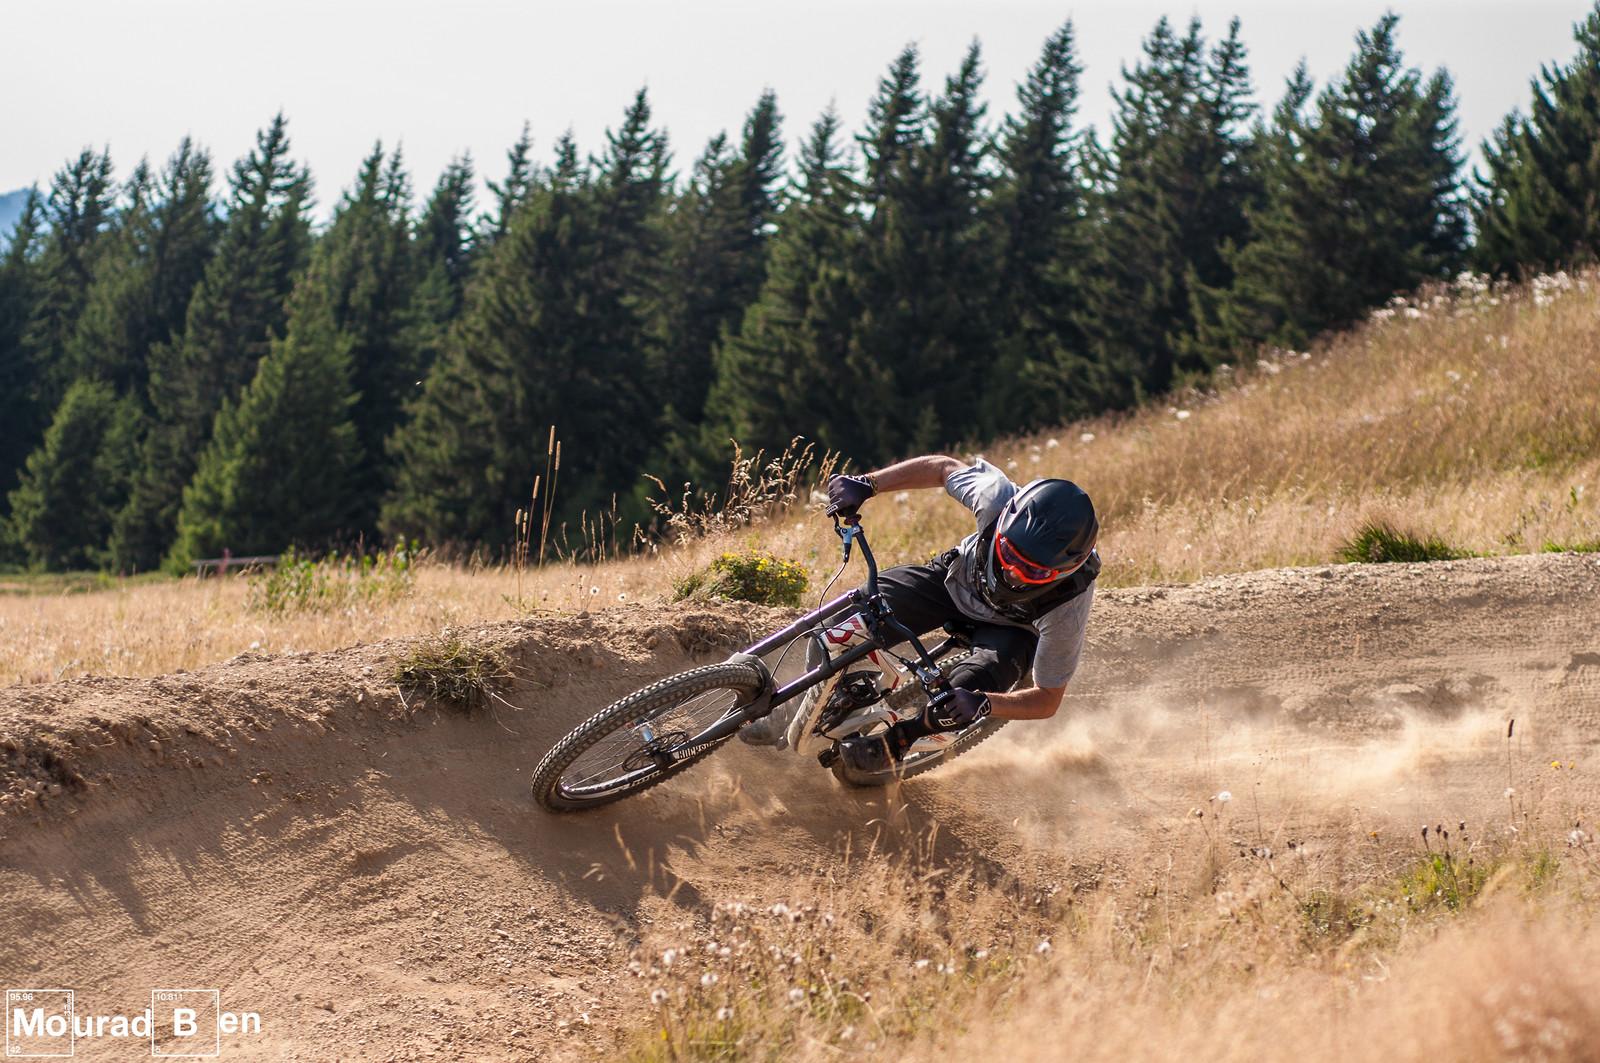 Turn - Romuald_Manach - Mountain Biking Pictures - Vital MTB